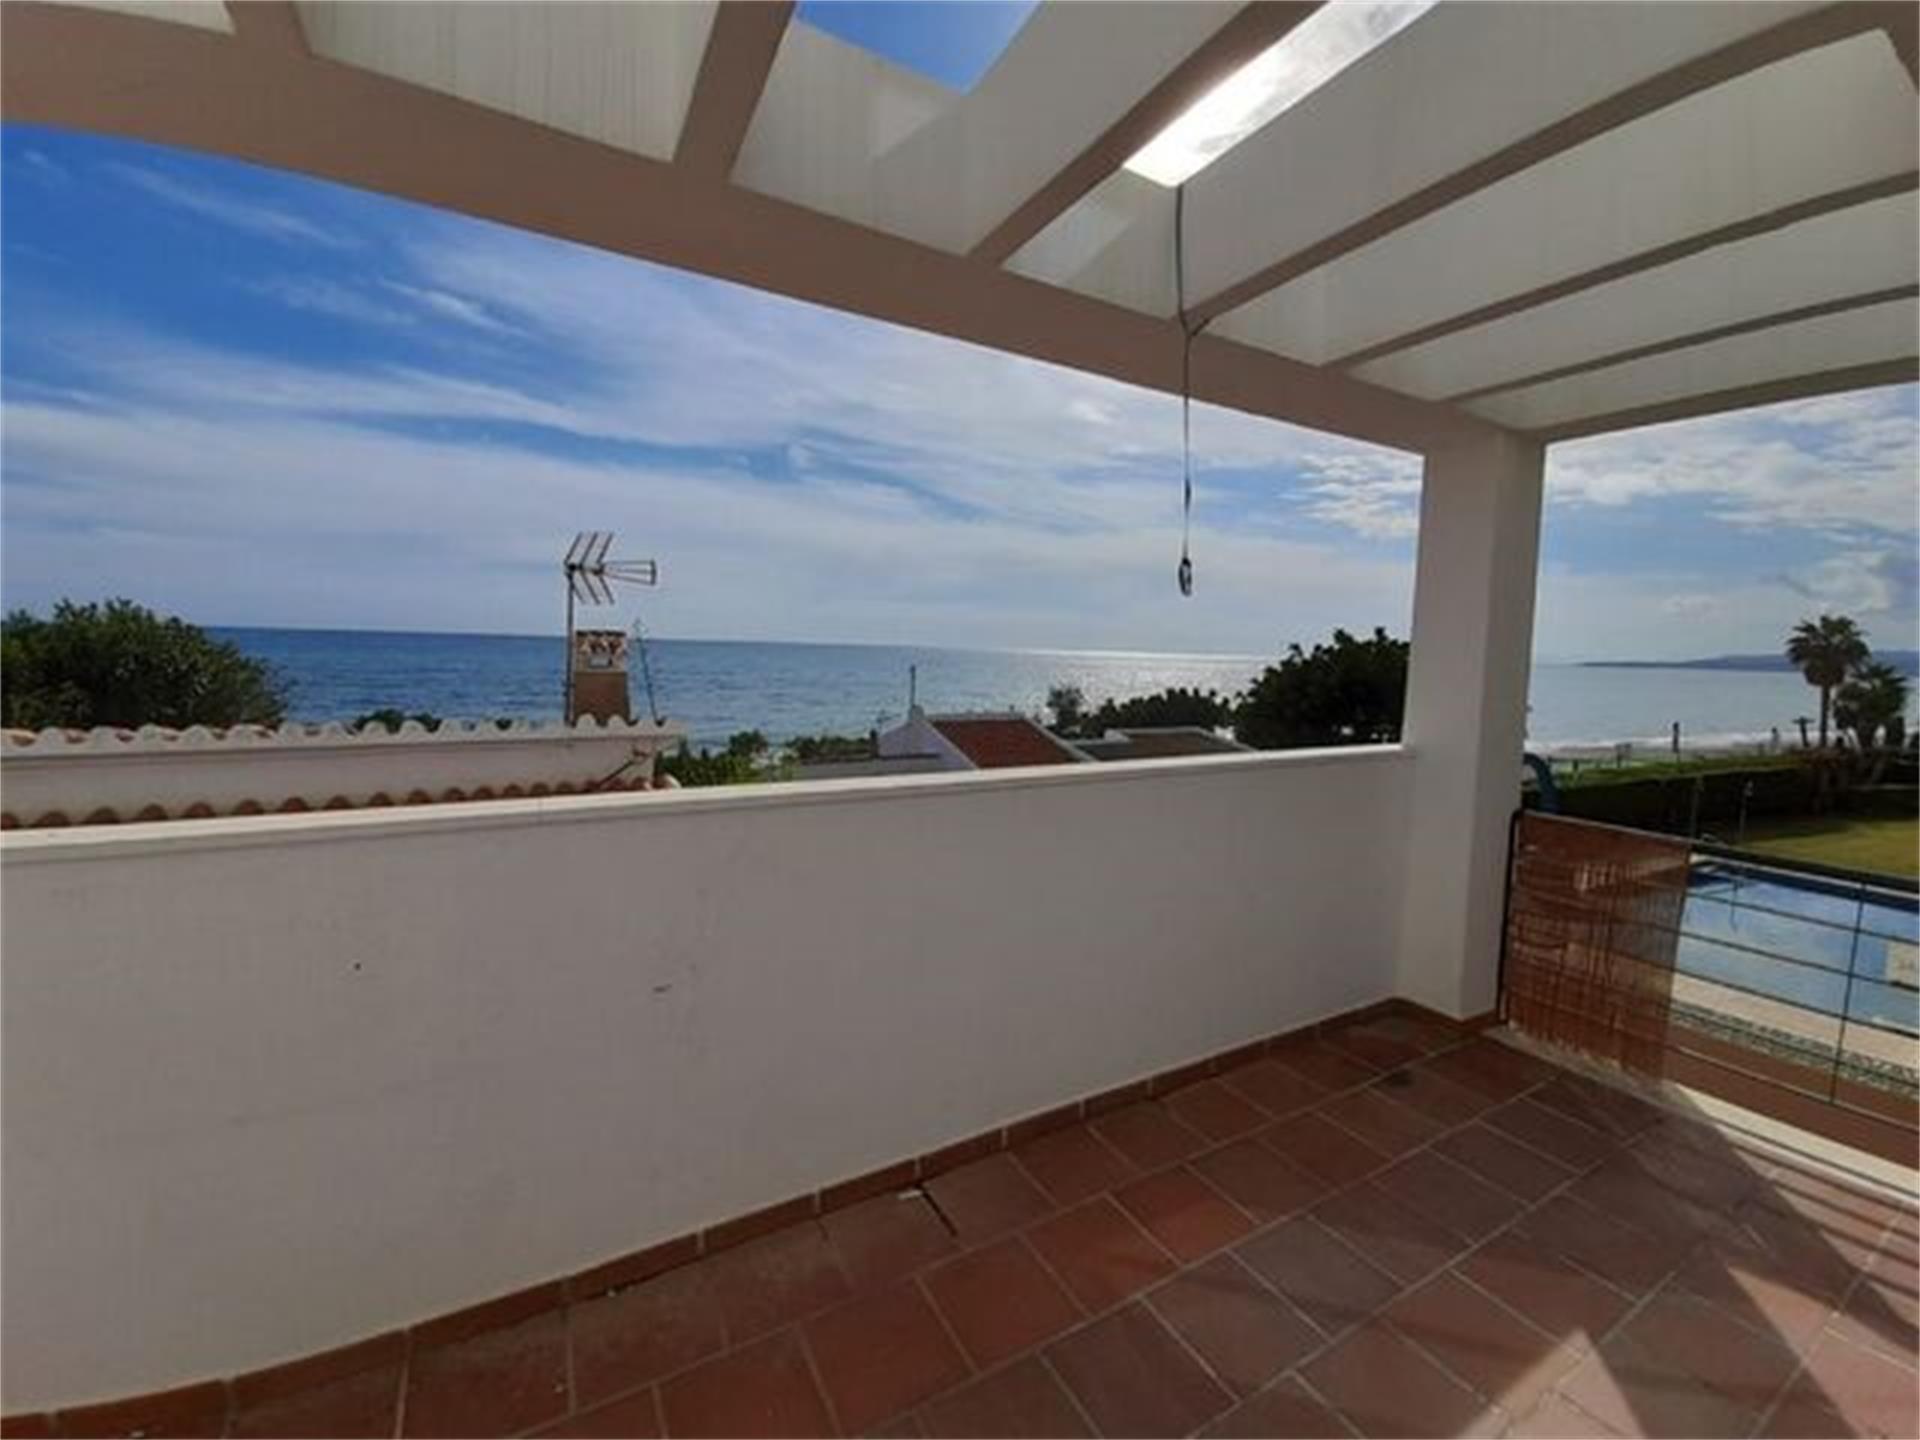 Apartamento de alquiler en Plaza Ctra de Almeria Urbanización Santa Rosa (Torrox, Málaga)